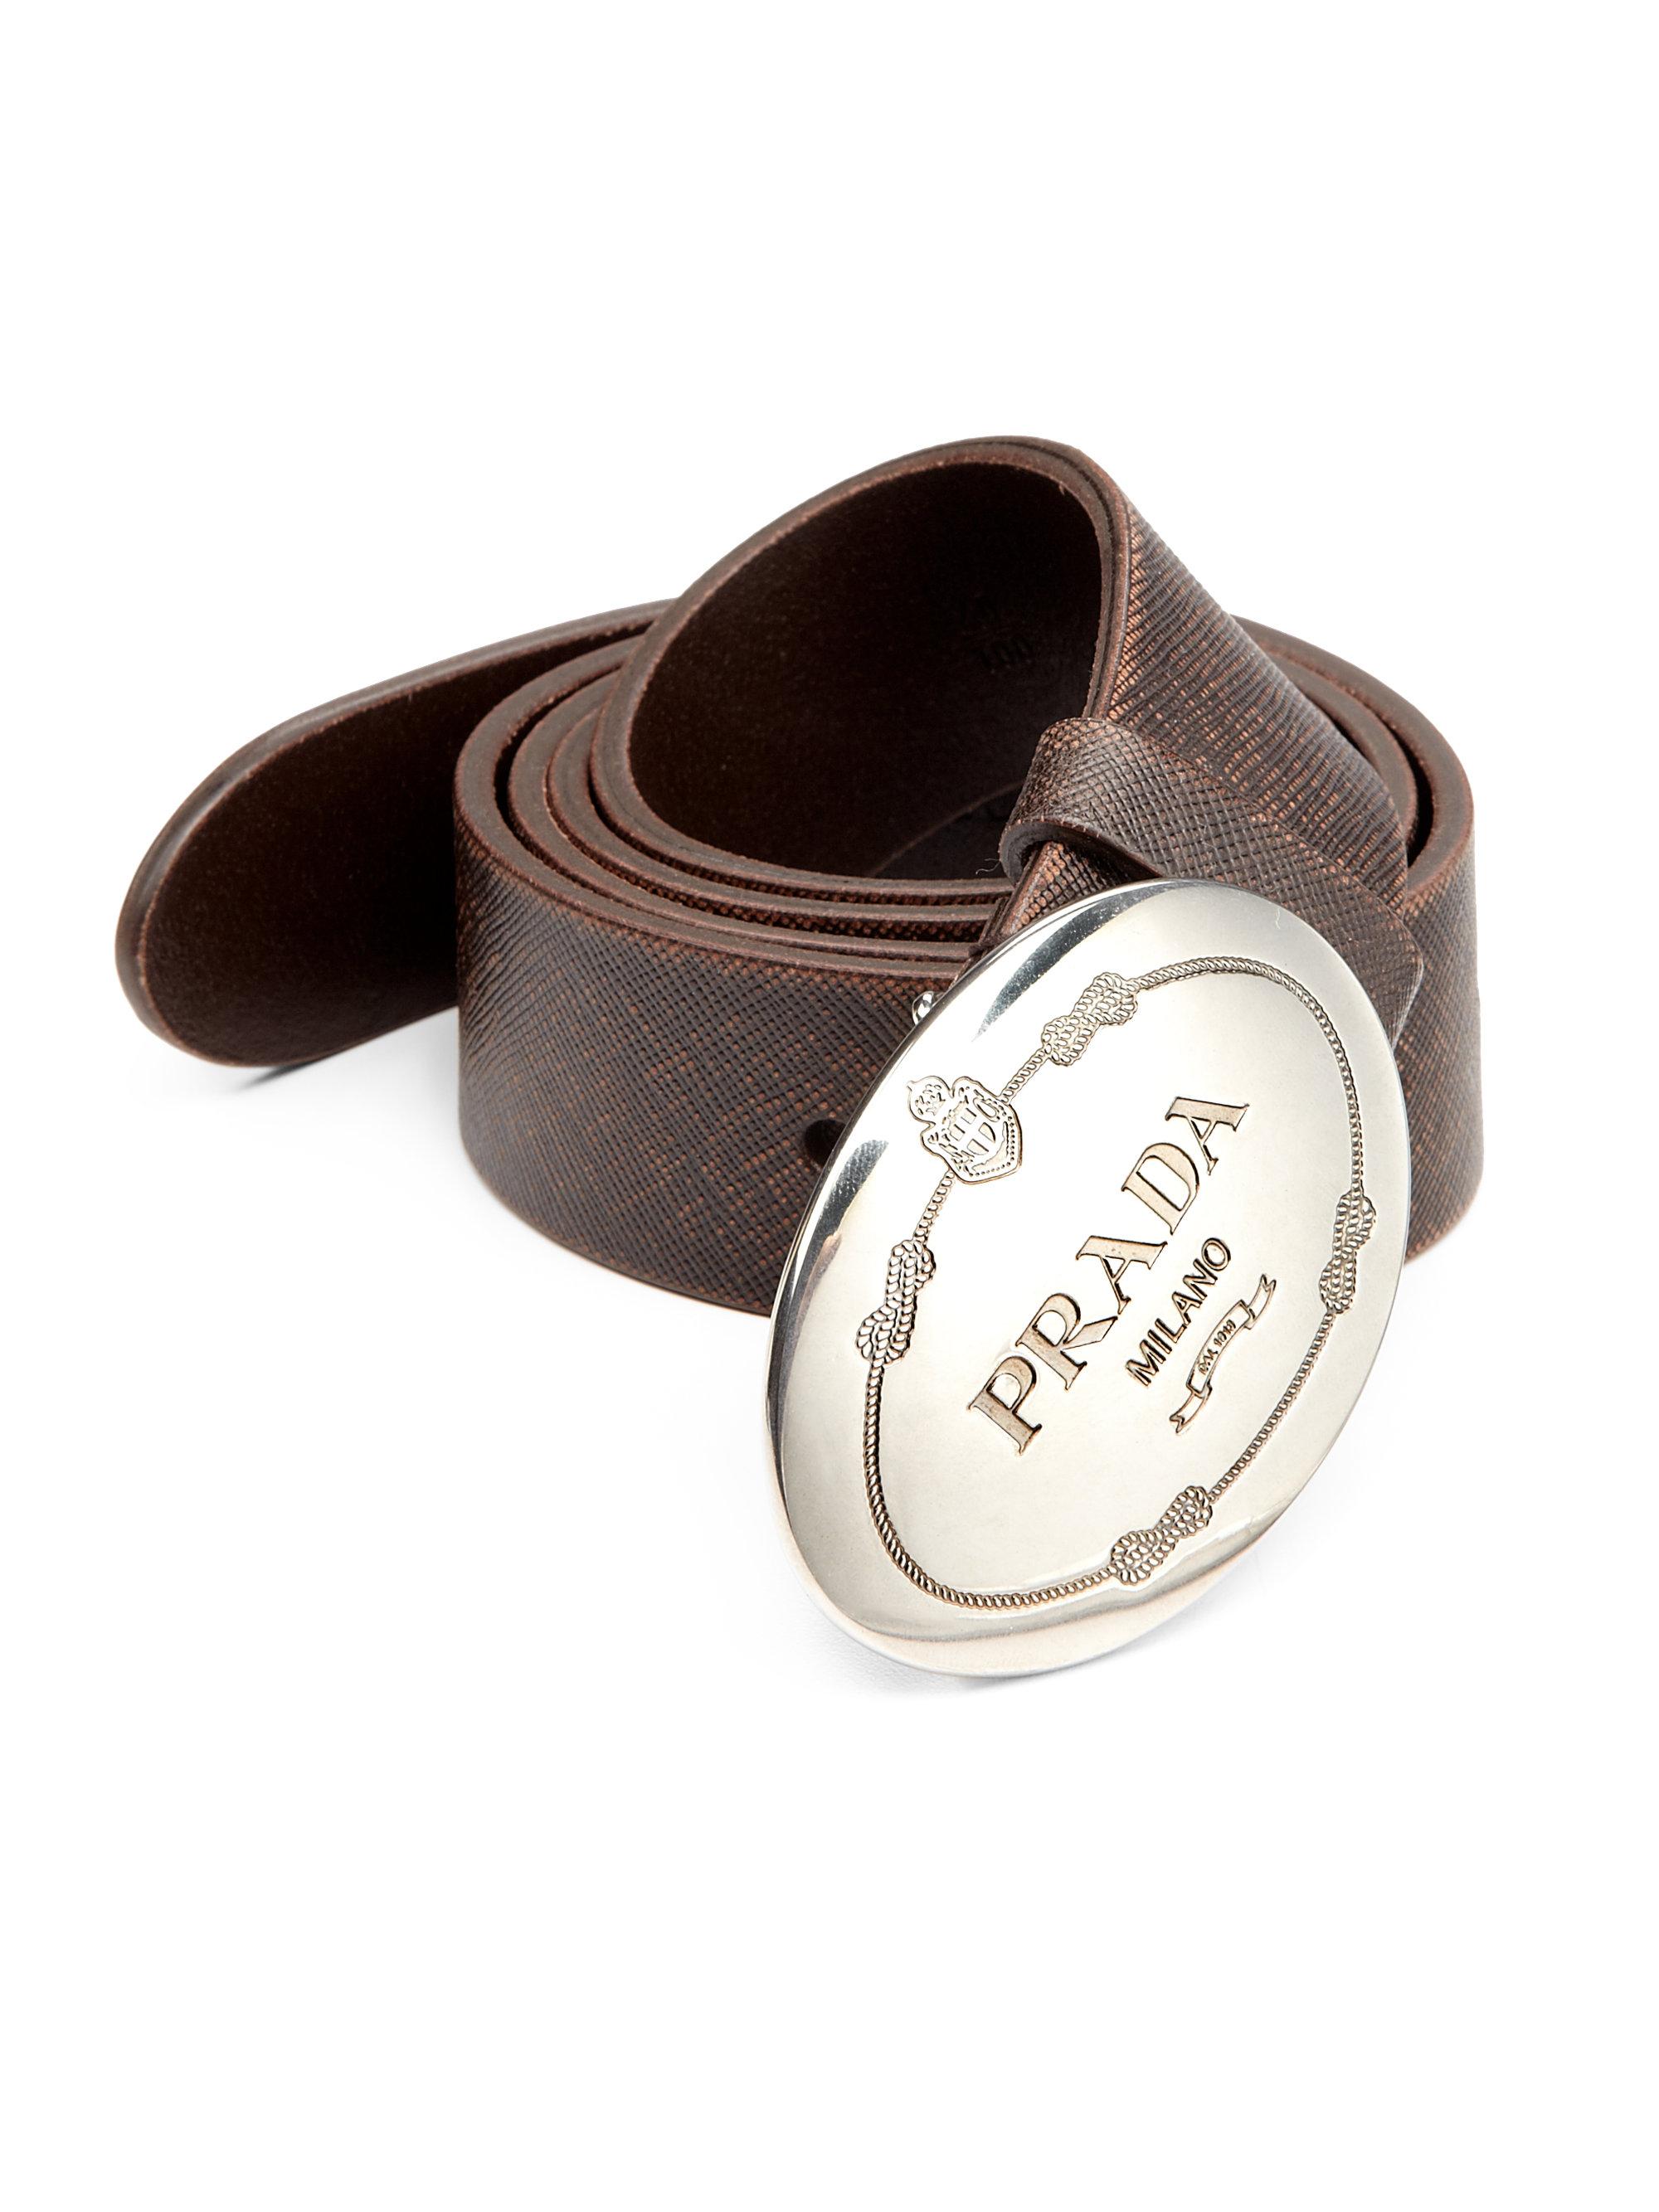 Prada Leather Cinture Belt In Brown For Men